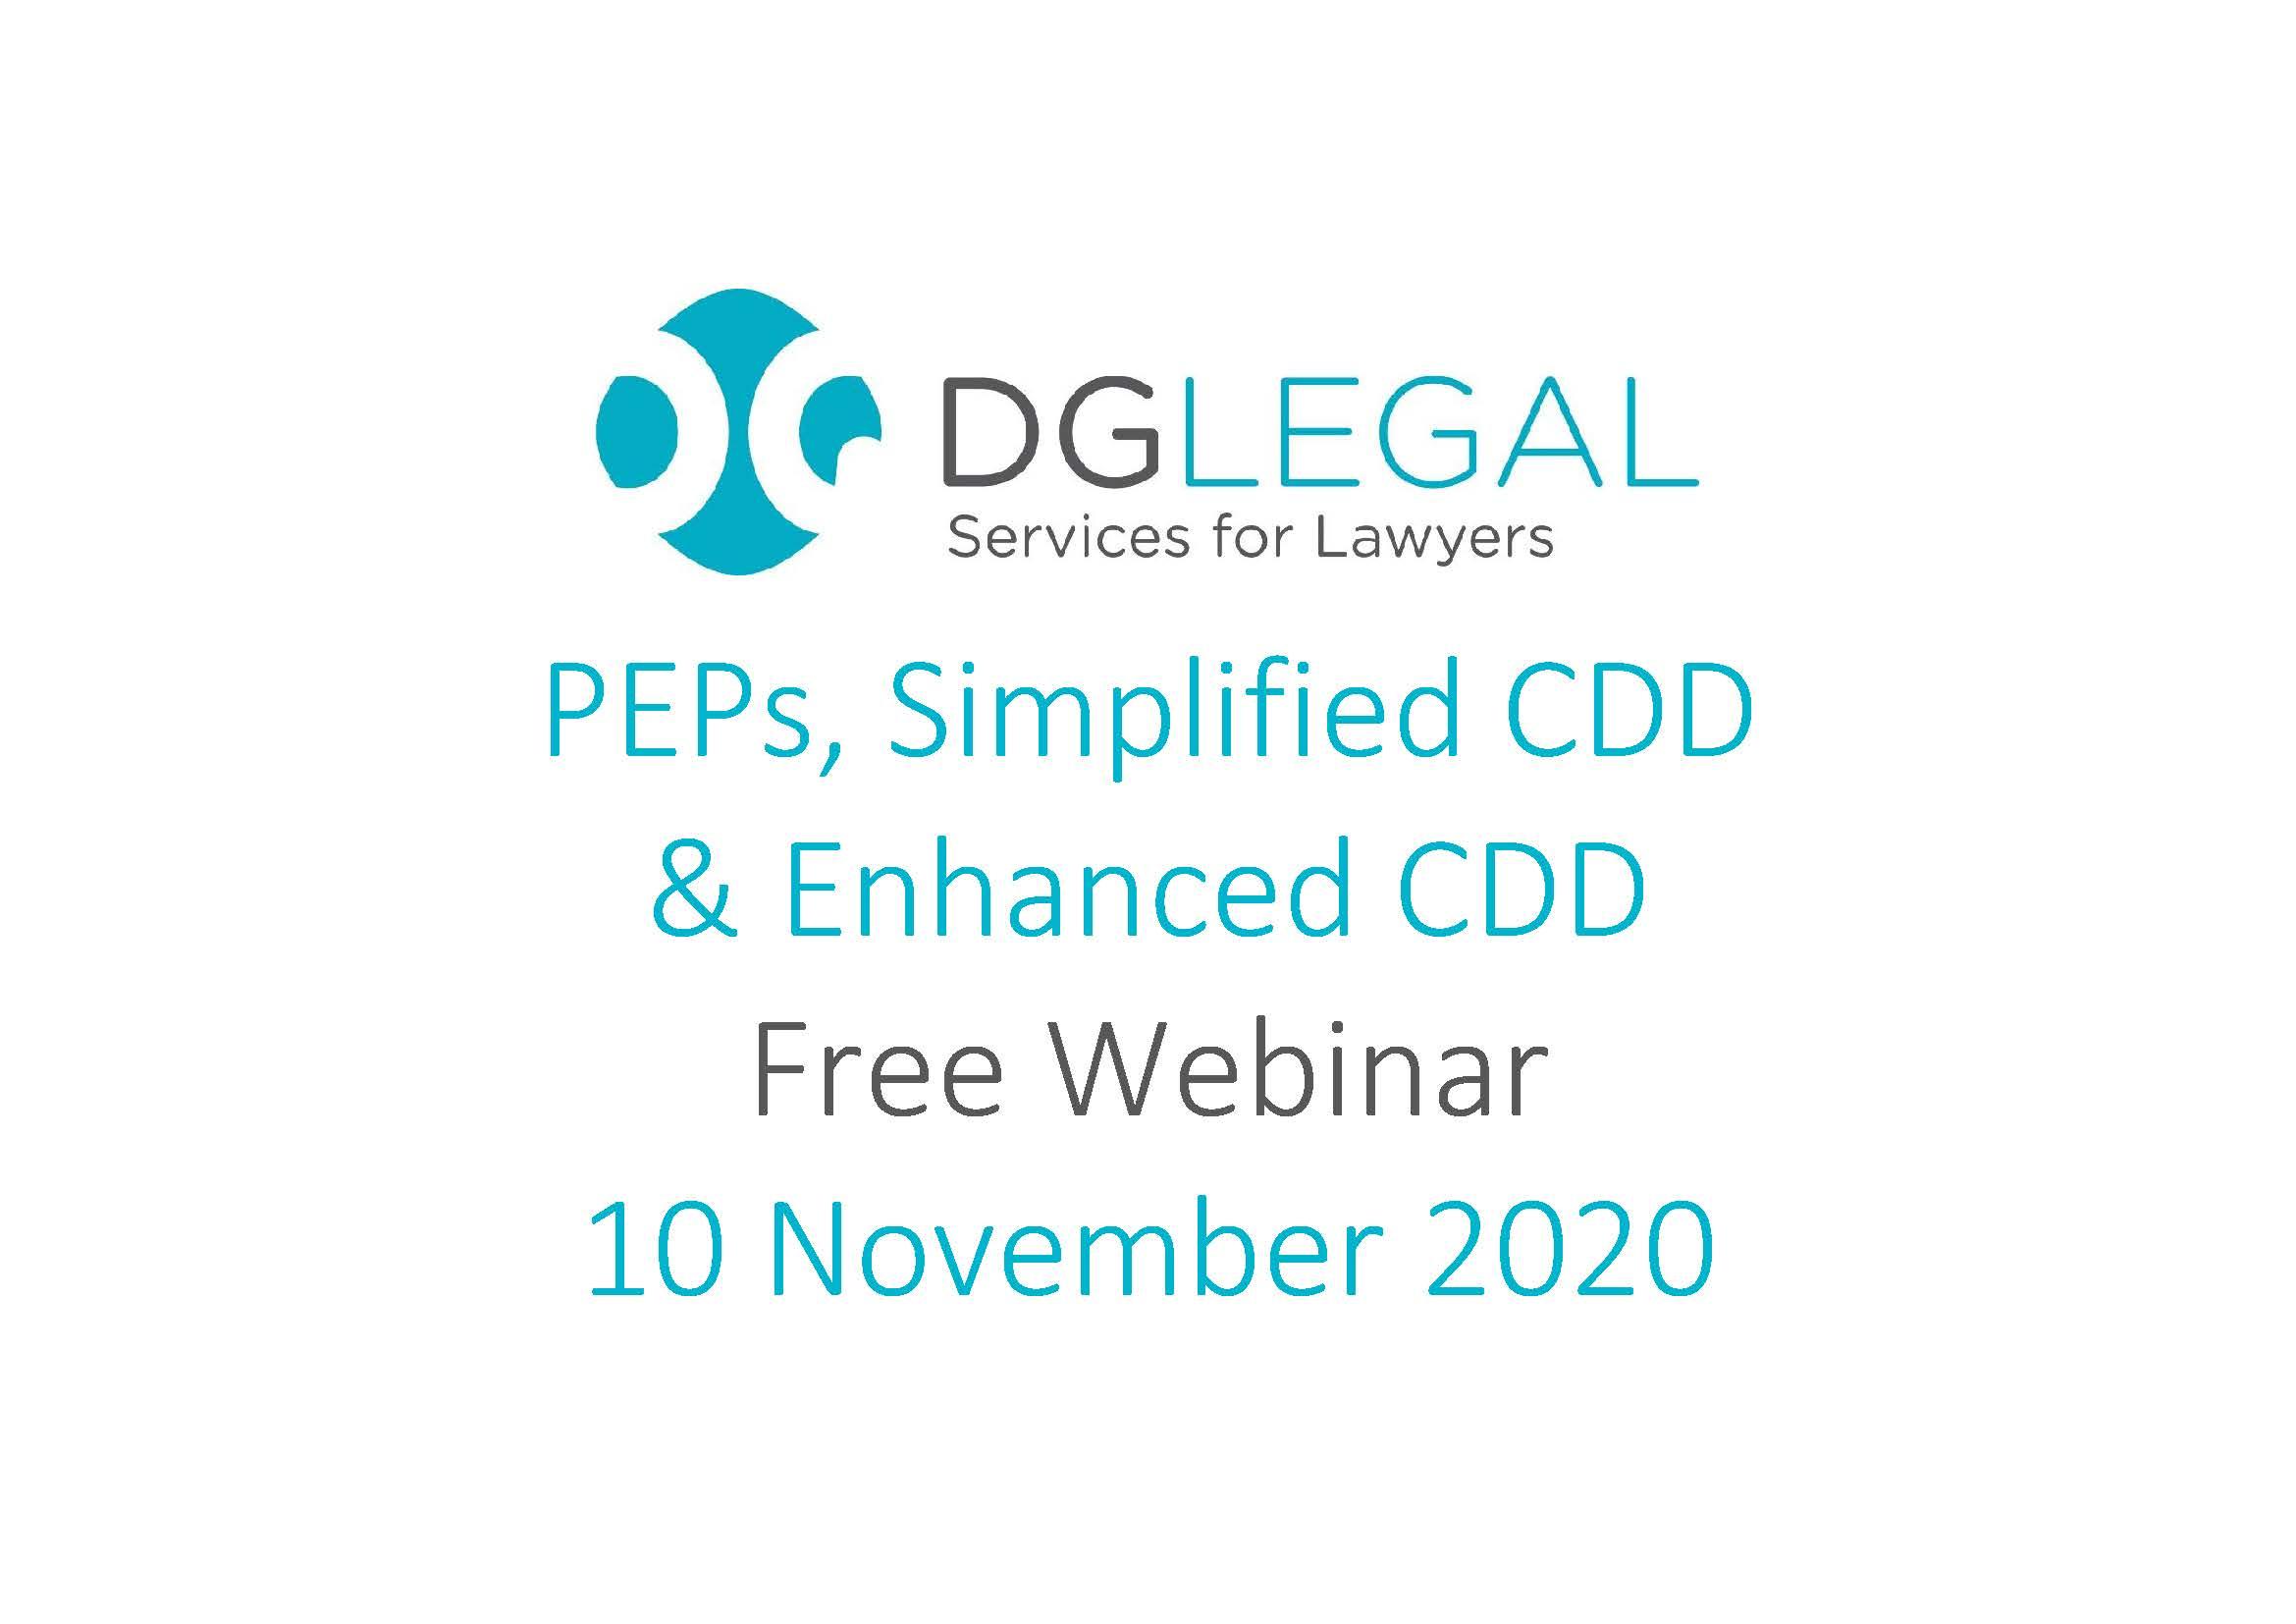 PEPs, Simplified CDD & Enhanced CDD